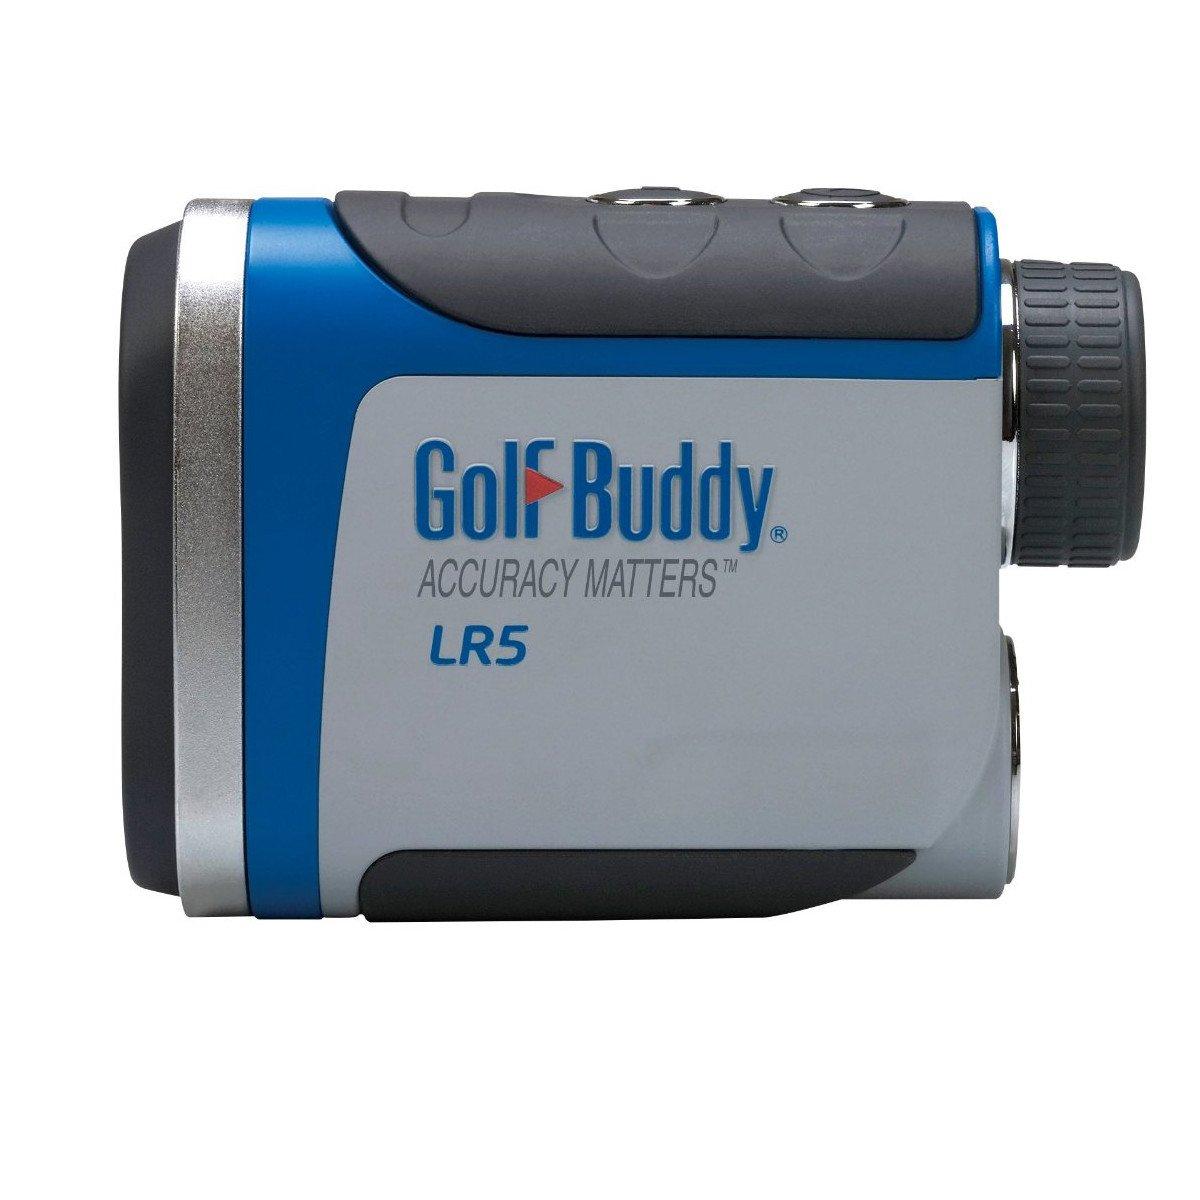 GolfBuddy LR5 Golf Laser Rangefinder, Light Gray/Blue